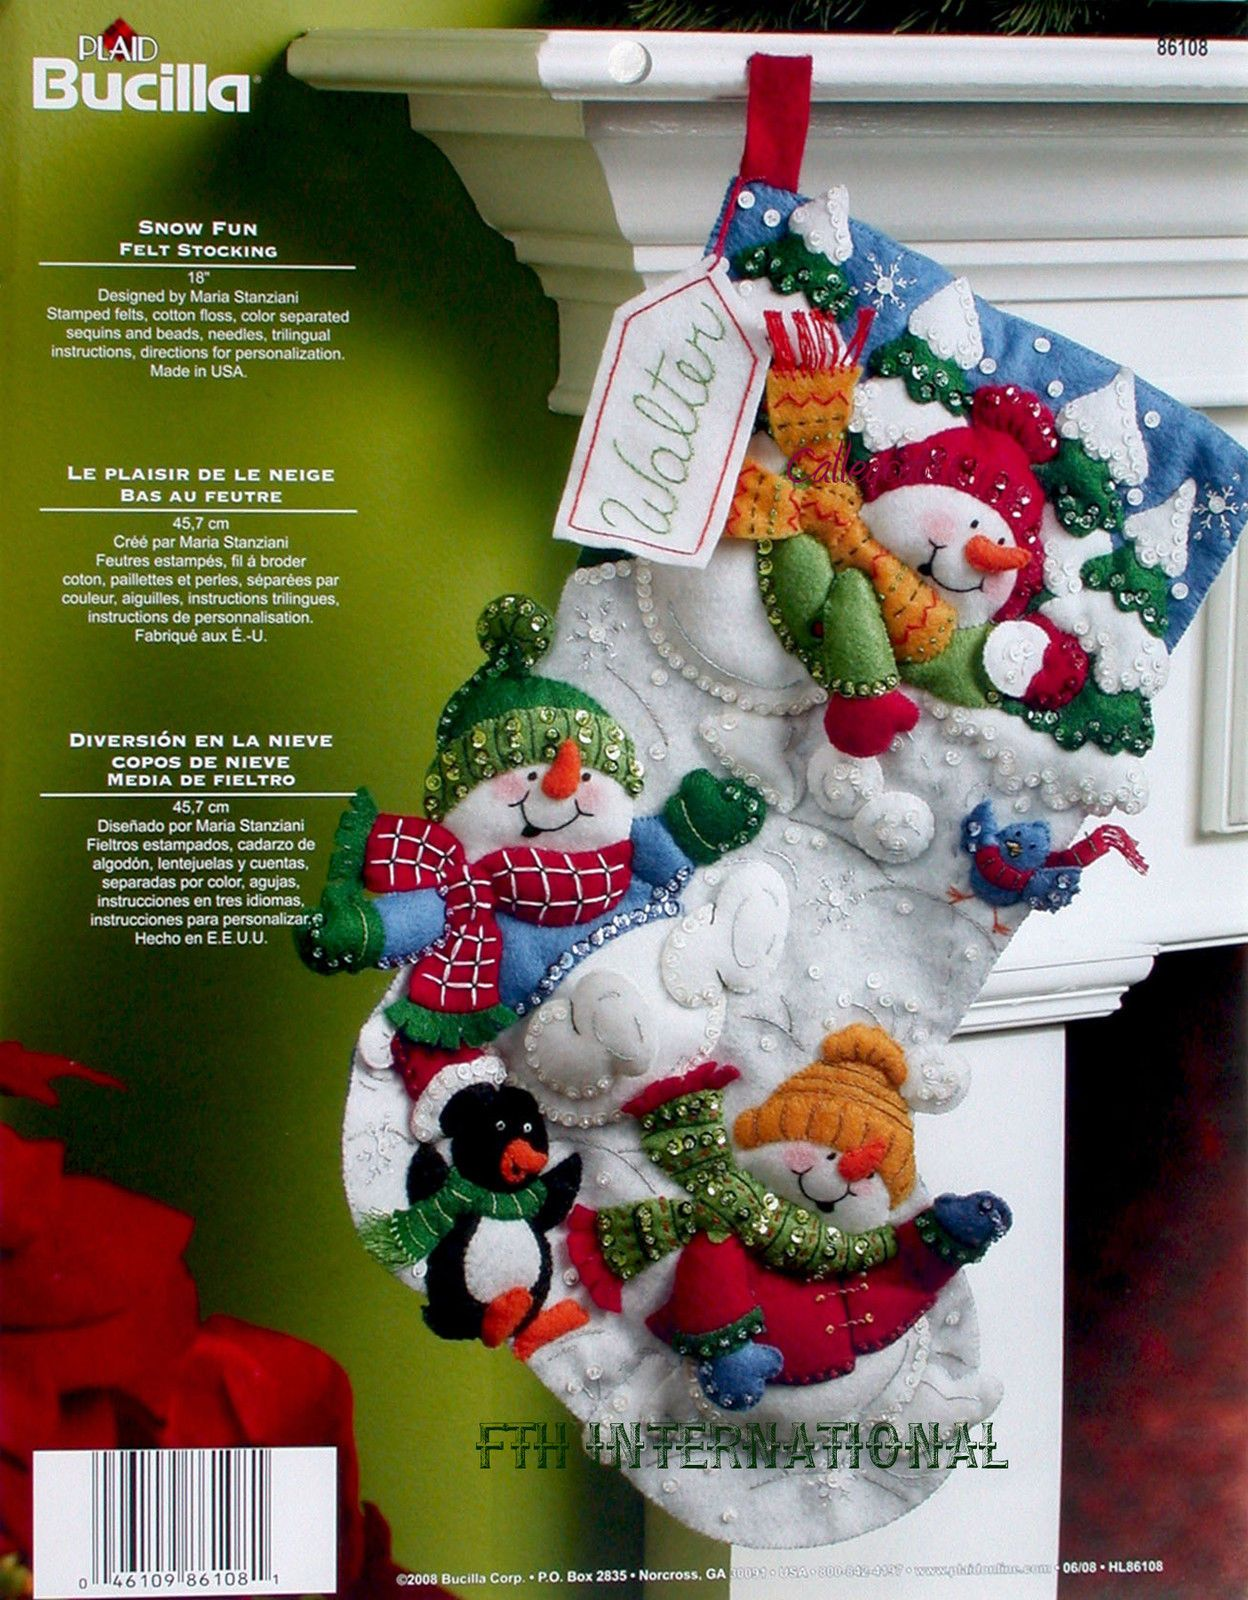 Bucilla Snow Fun 18 Felt Christmas Stocking Kit 86108 Snowmen Penguin New Christmas Stocking Kits Felt Christmas Felt Christmas Stockings